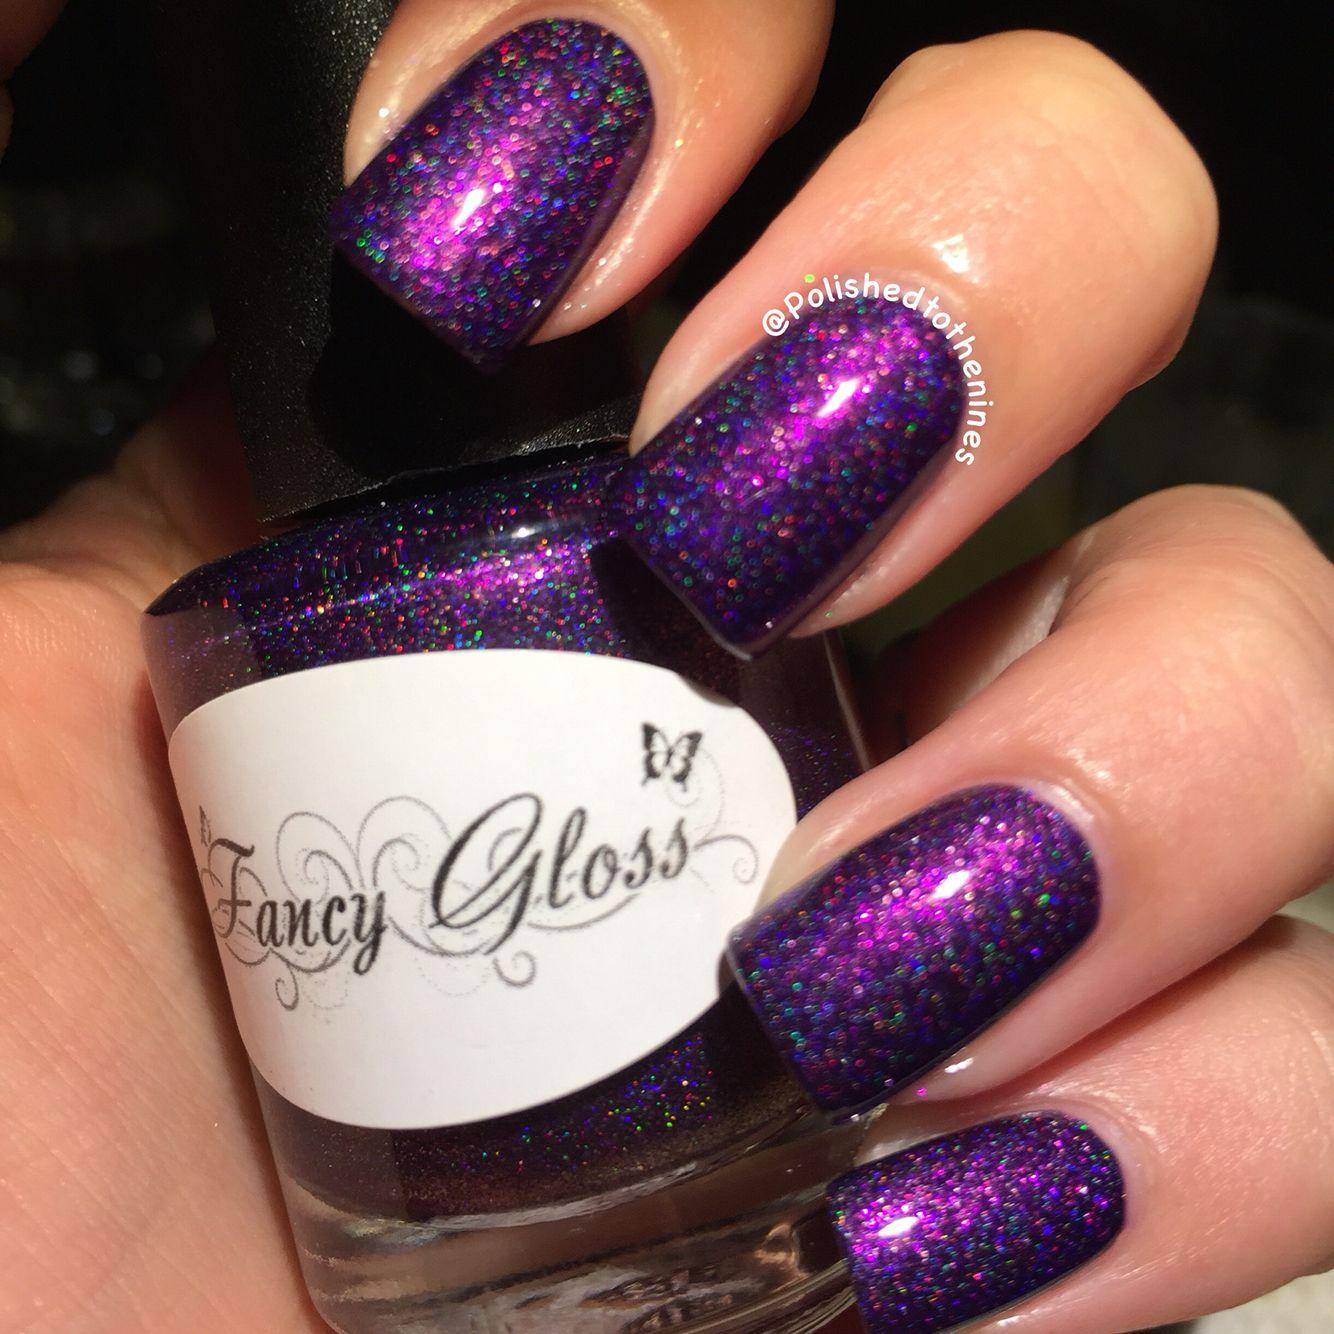 Fancy Gloss - Dark Fury (in USA Katie LeBron Frank) | NAIL ART ...